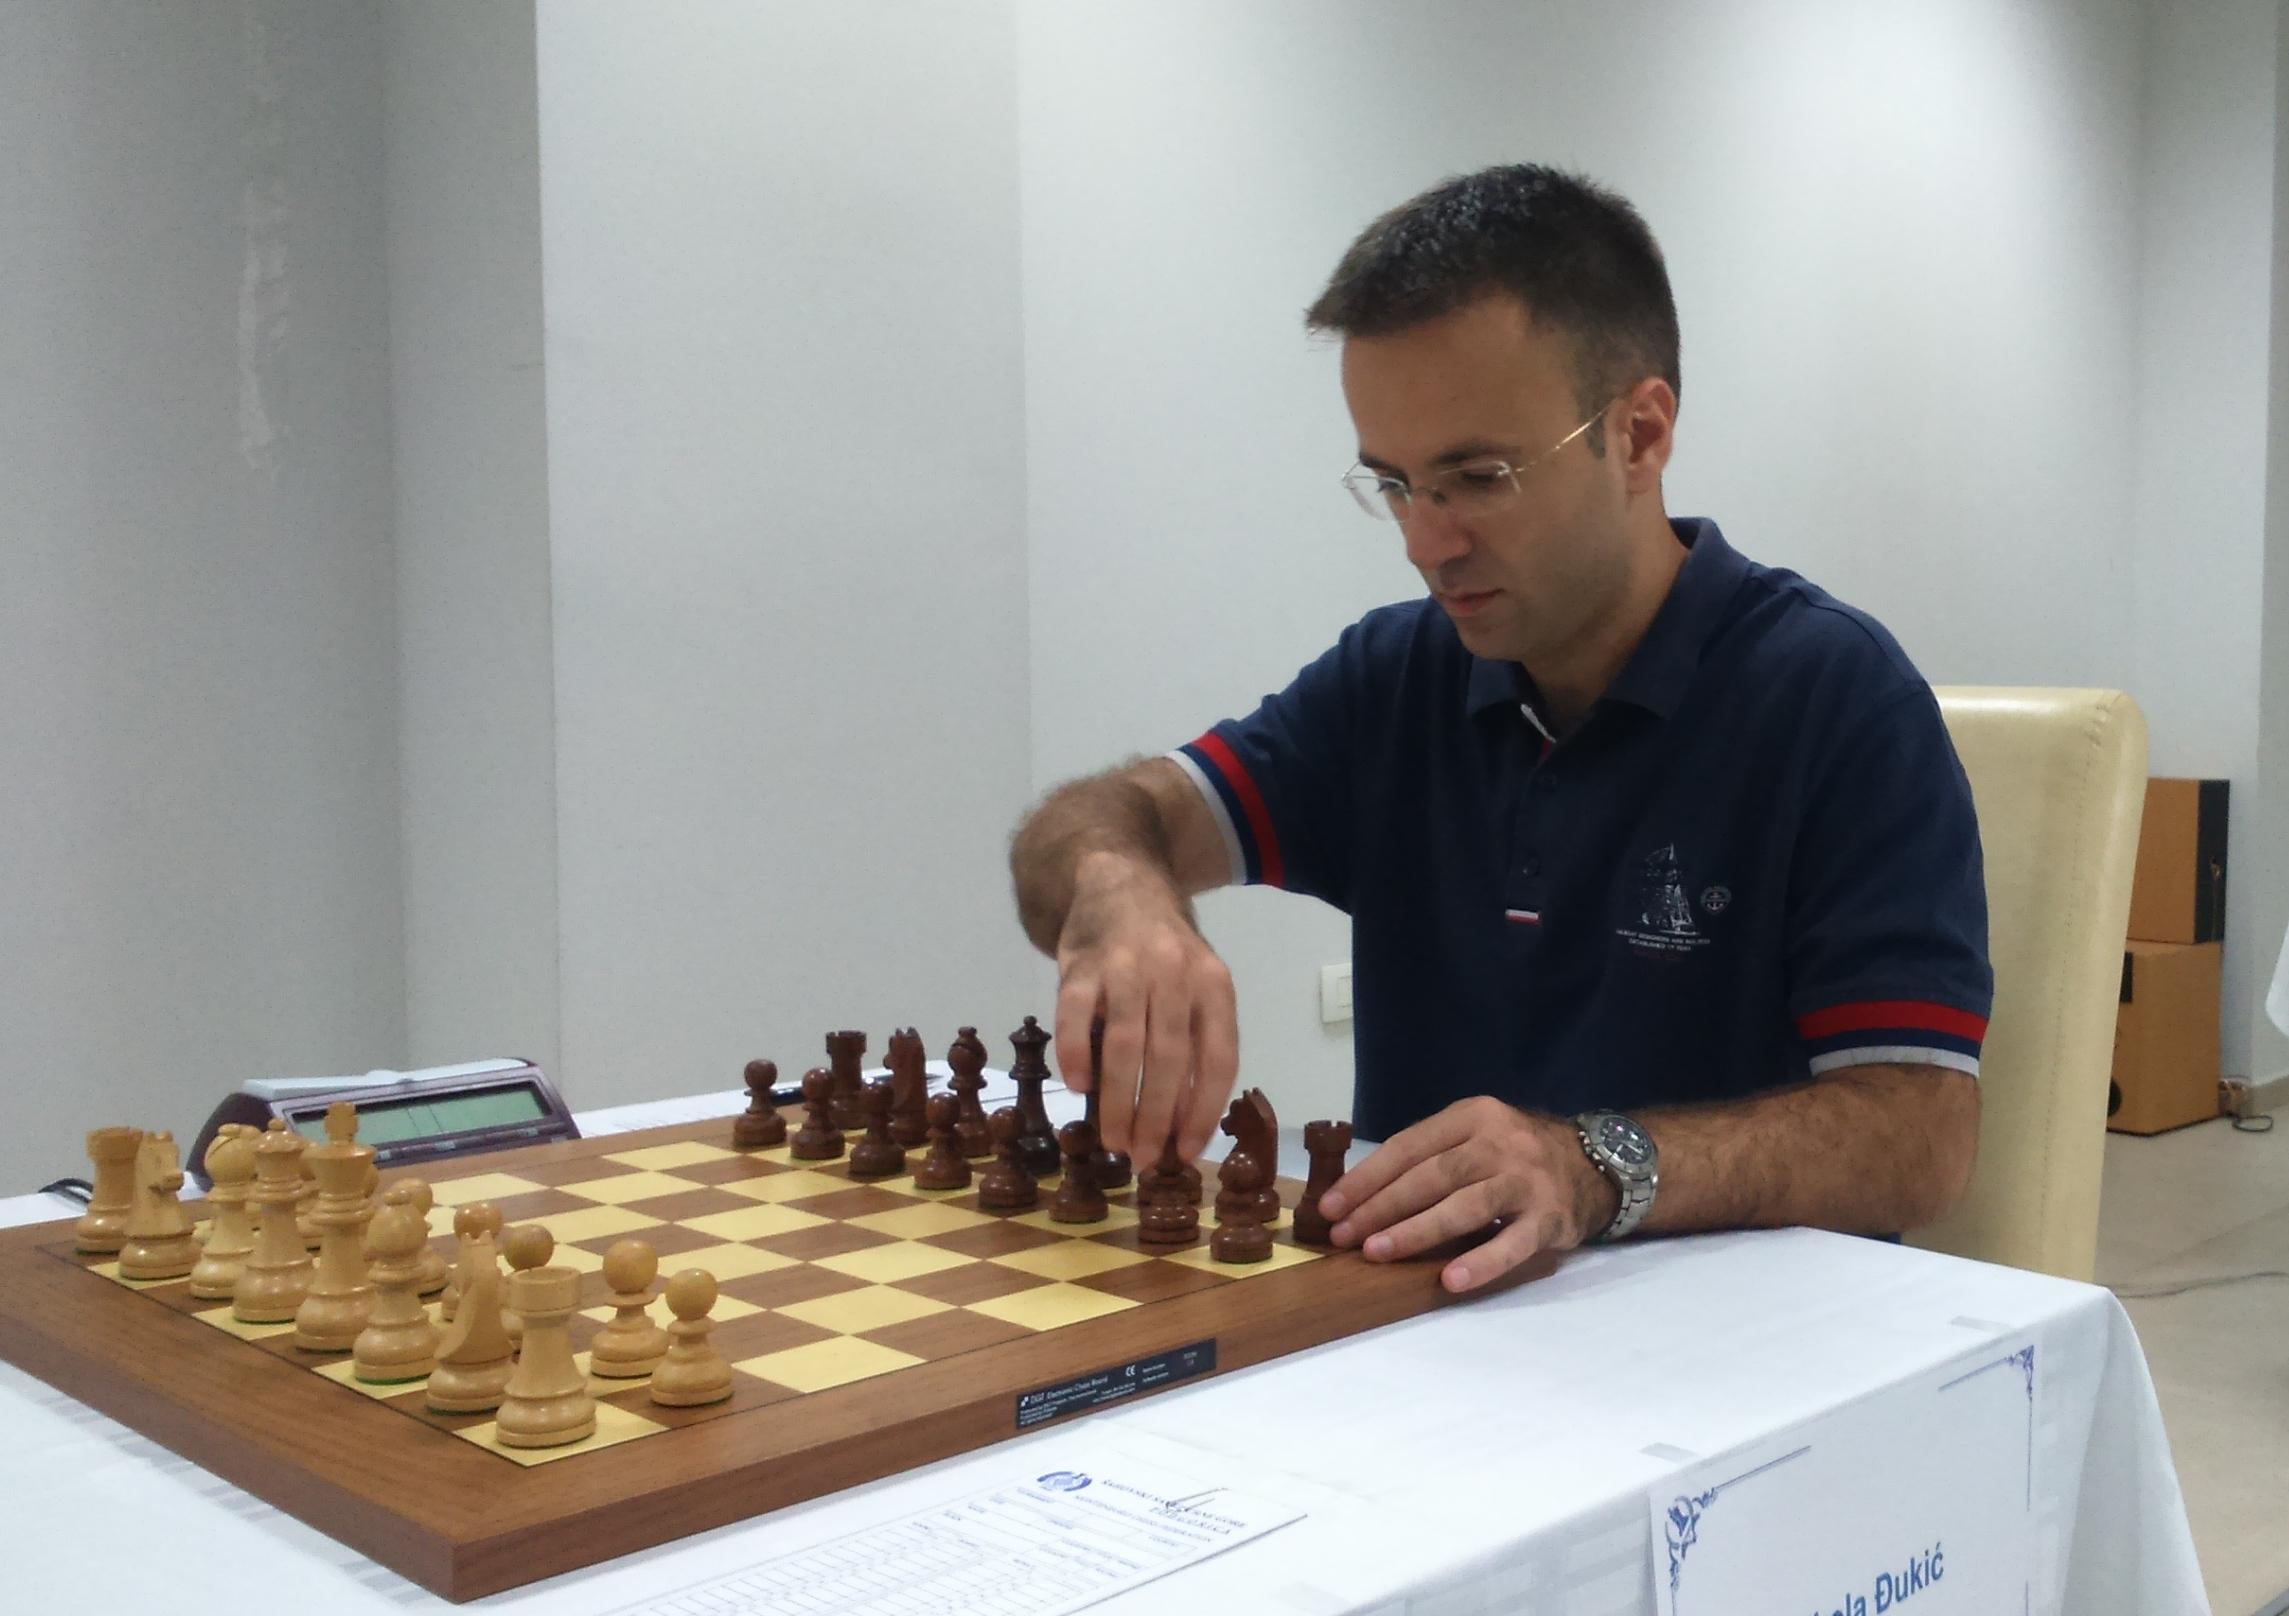 Naš najbolji šahista Nikola Đukić